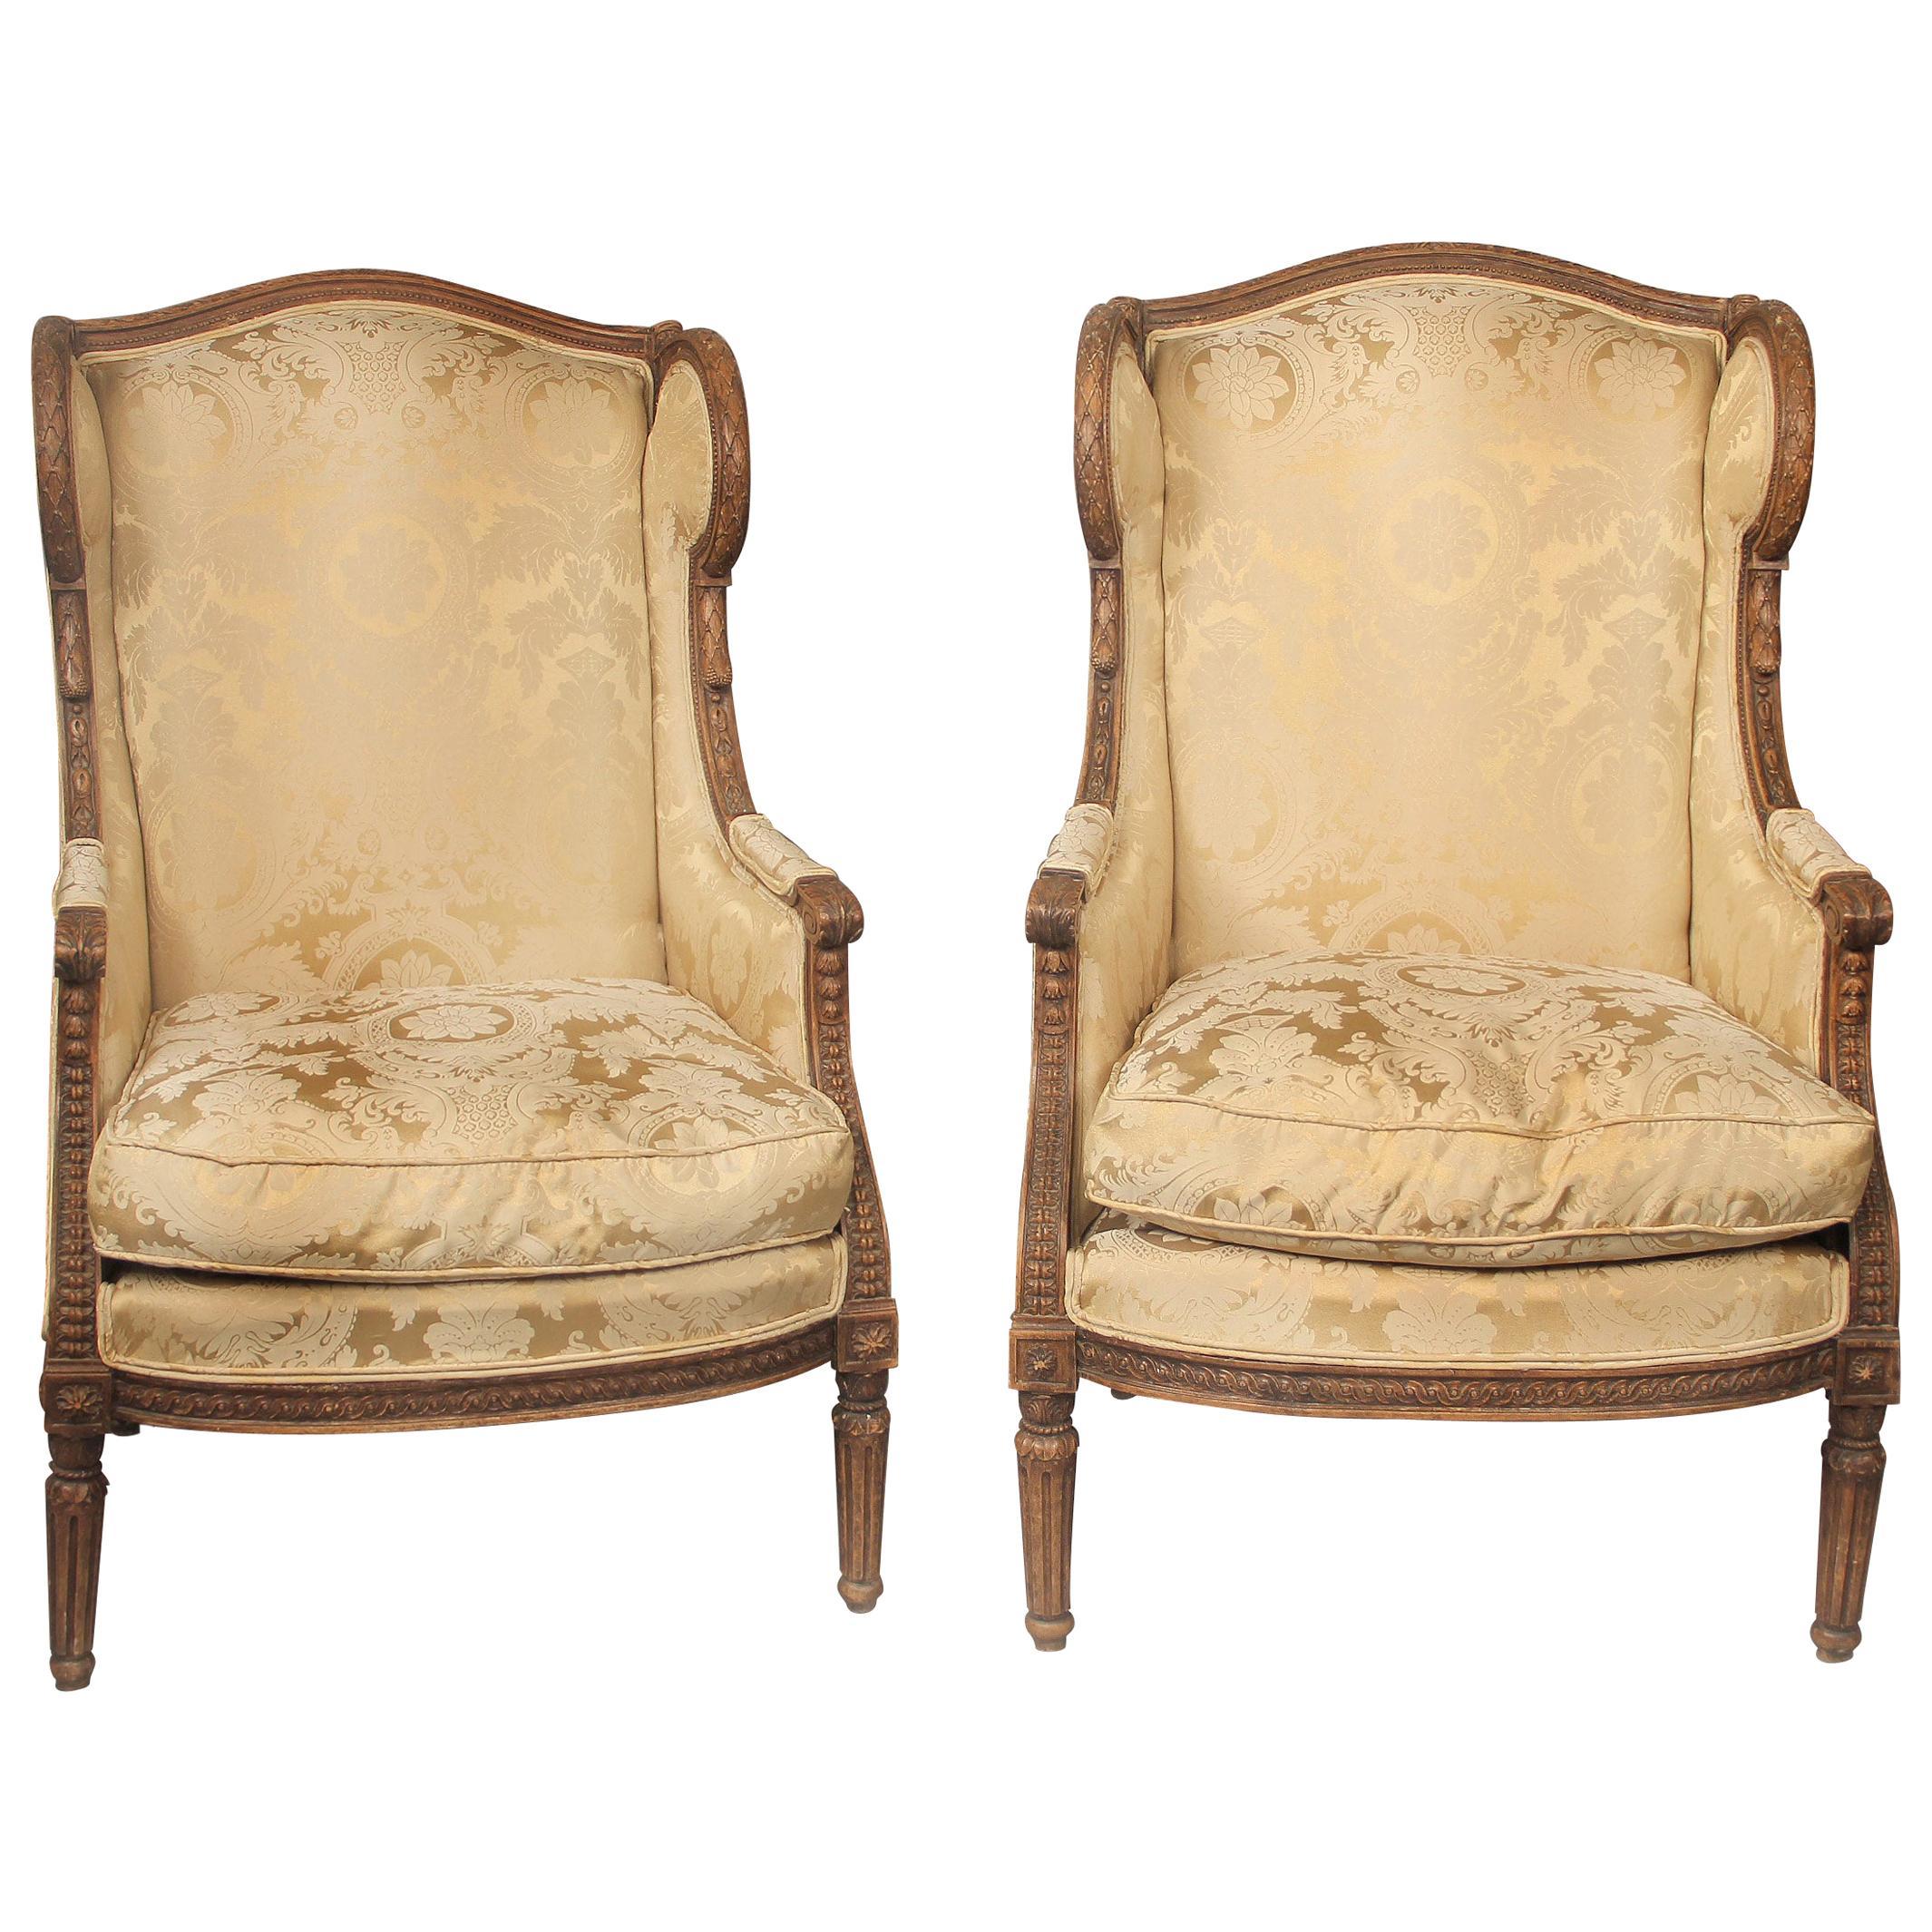 Wonderful Pair of Late 19th Century Louis XVI Style Carved Wood Bergères